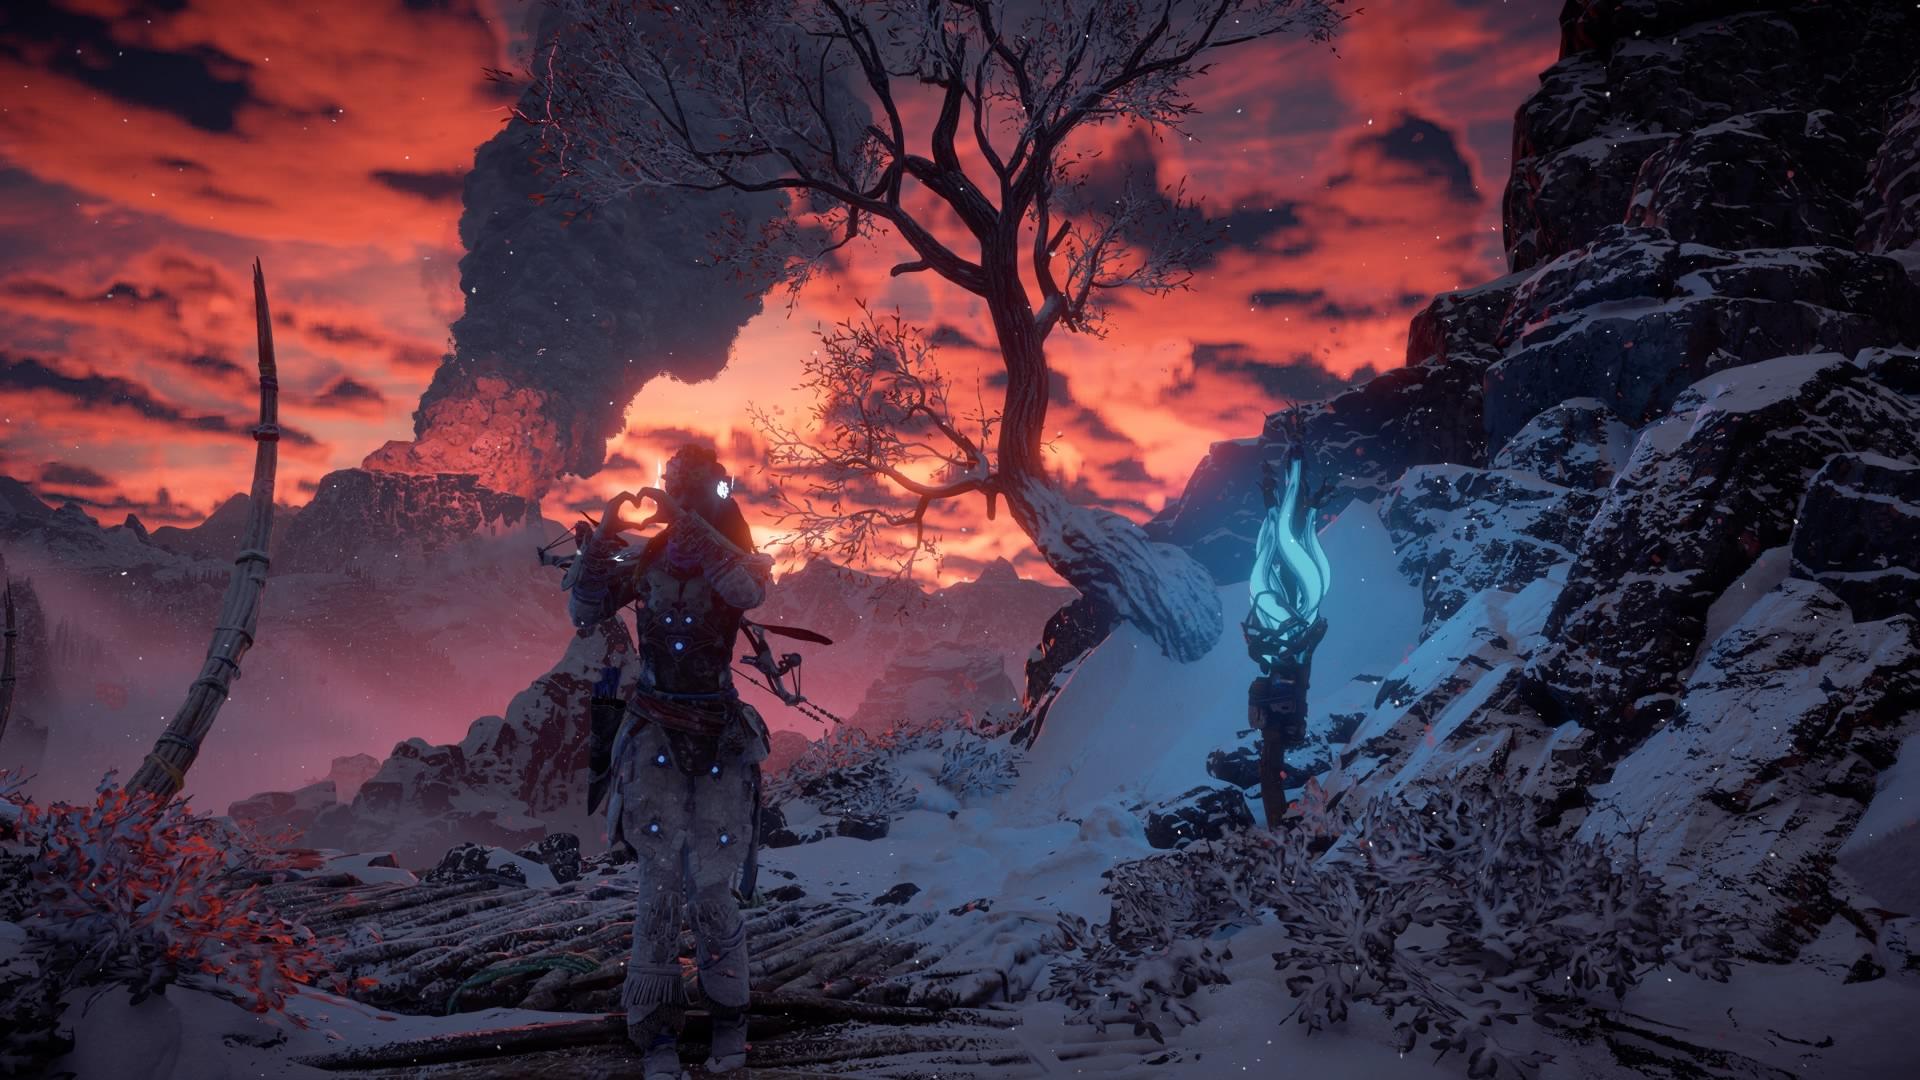 Элой - Horizon: Zero Dawn The Frozen Wilds, Персонаж